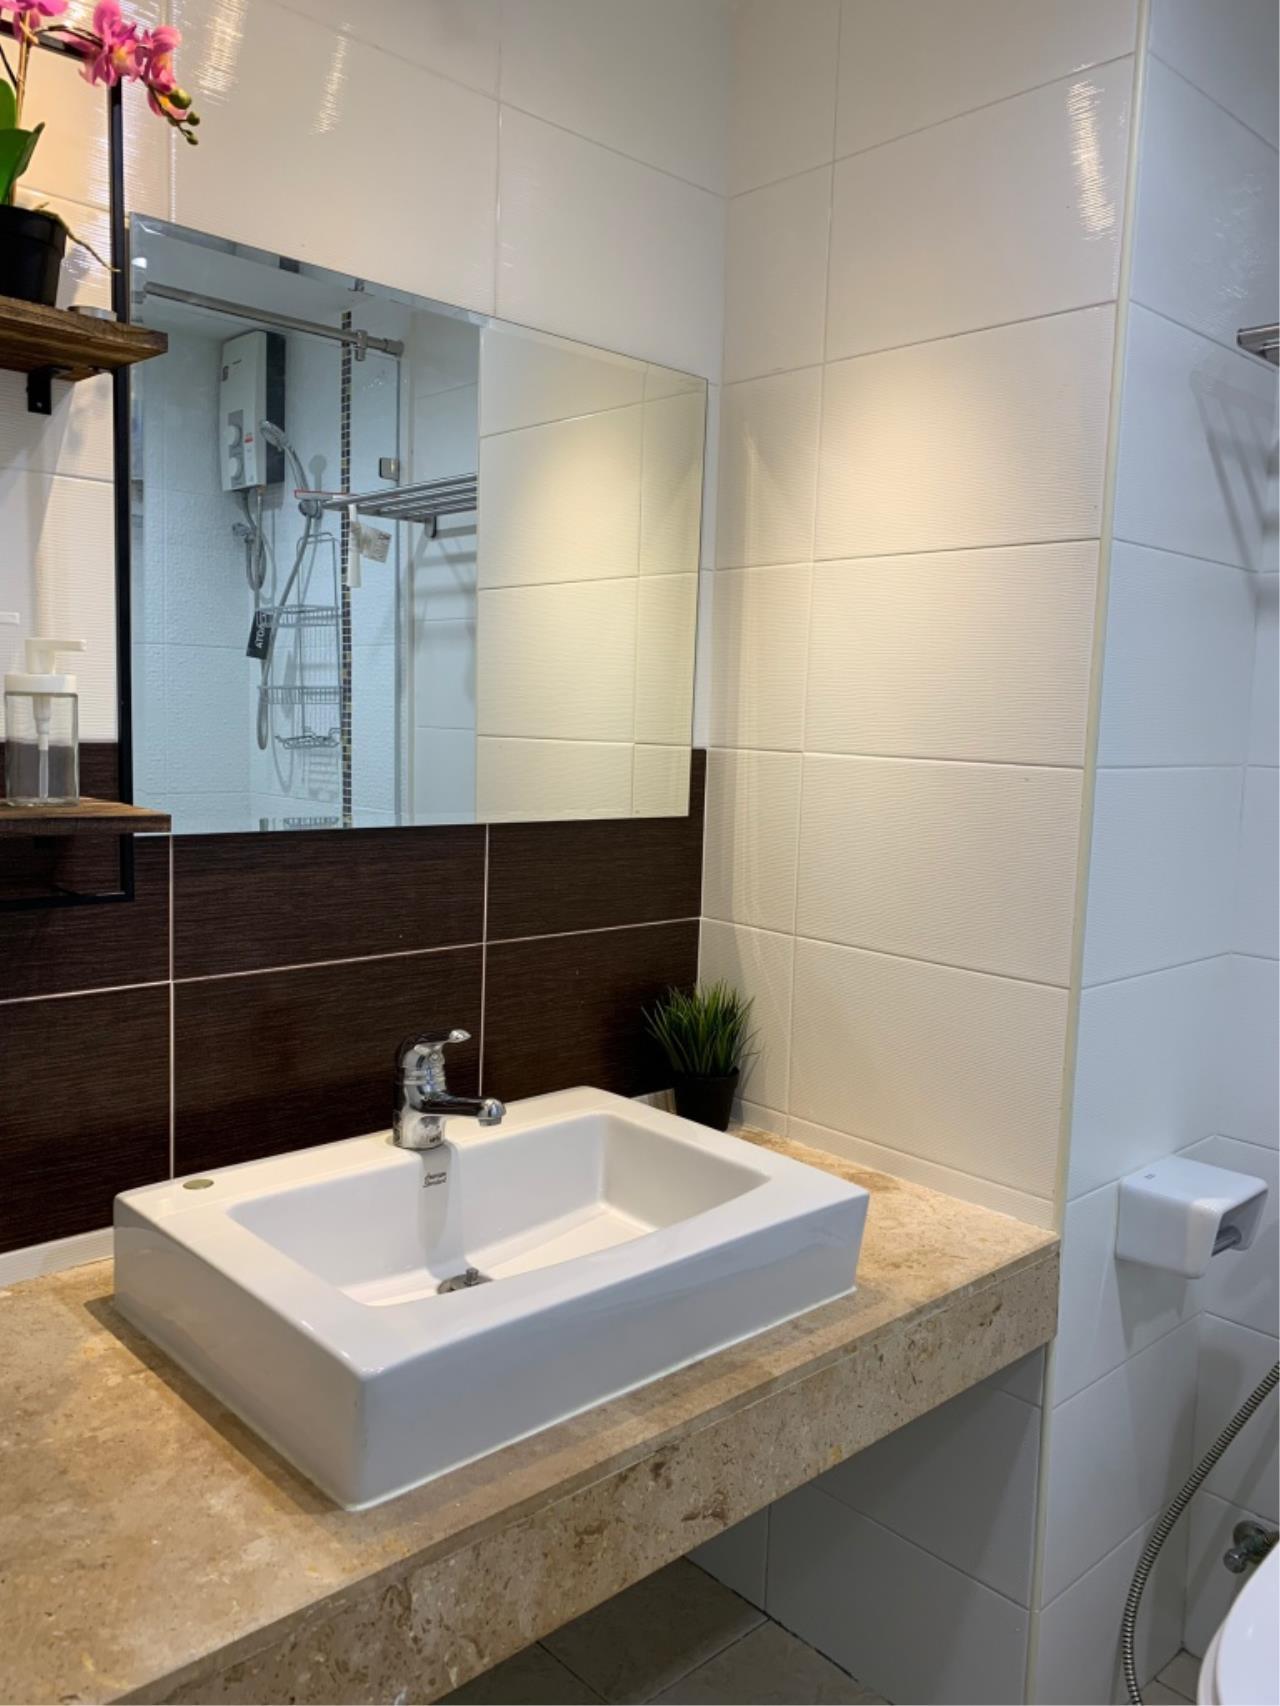 Century21 Skylux Agency's Grand Park View / Condo For Rent / 1 Bedroom / 35 SQM / MRT Blue Line / Bangkok 13